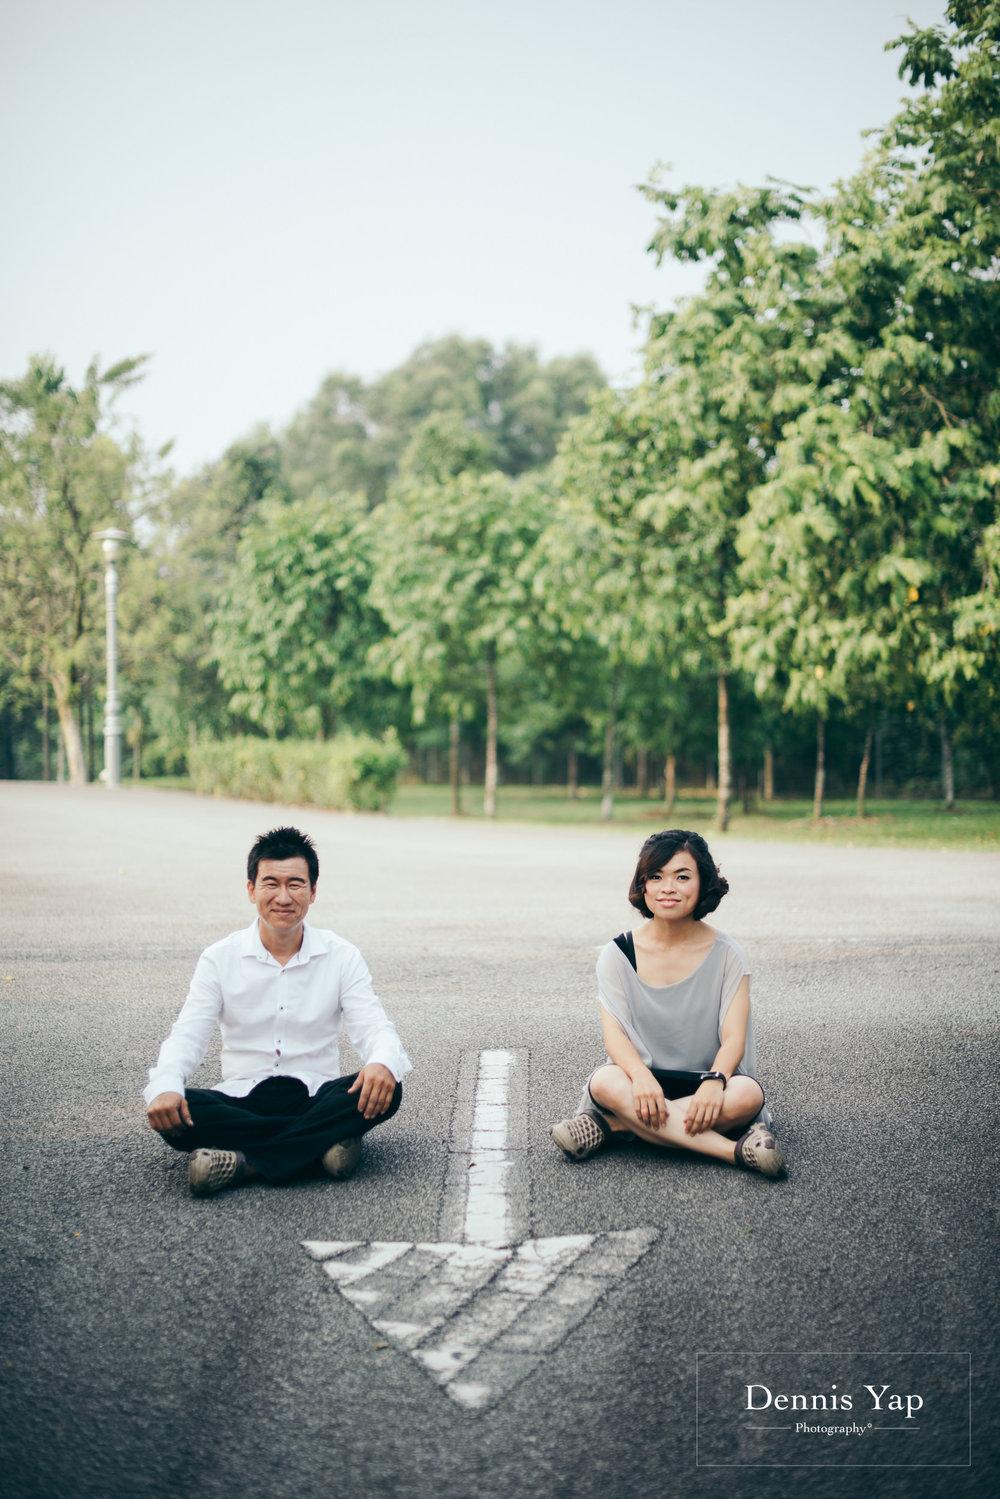 ping yi love celebration portrait dennis yap photography -1.jpg